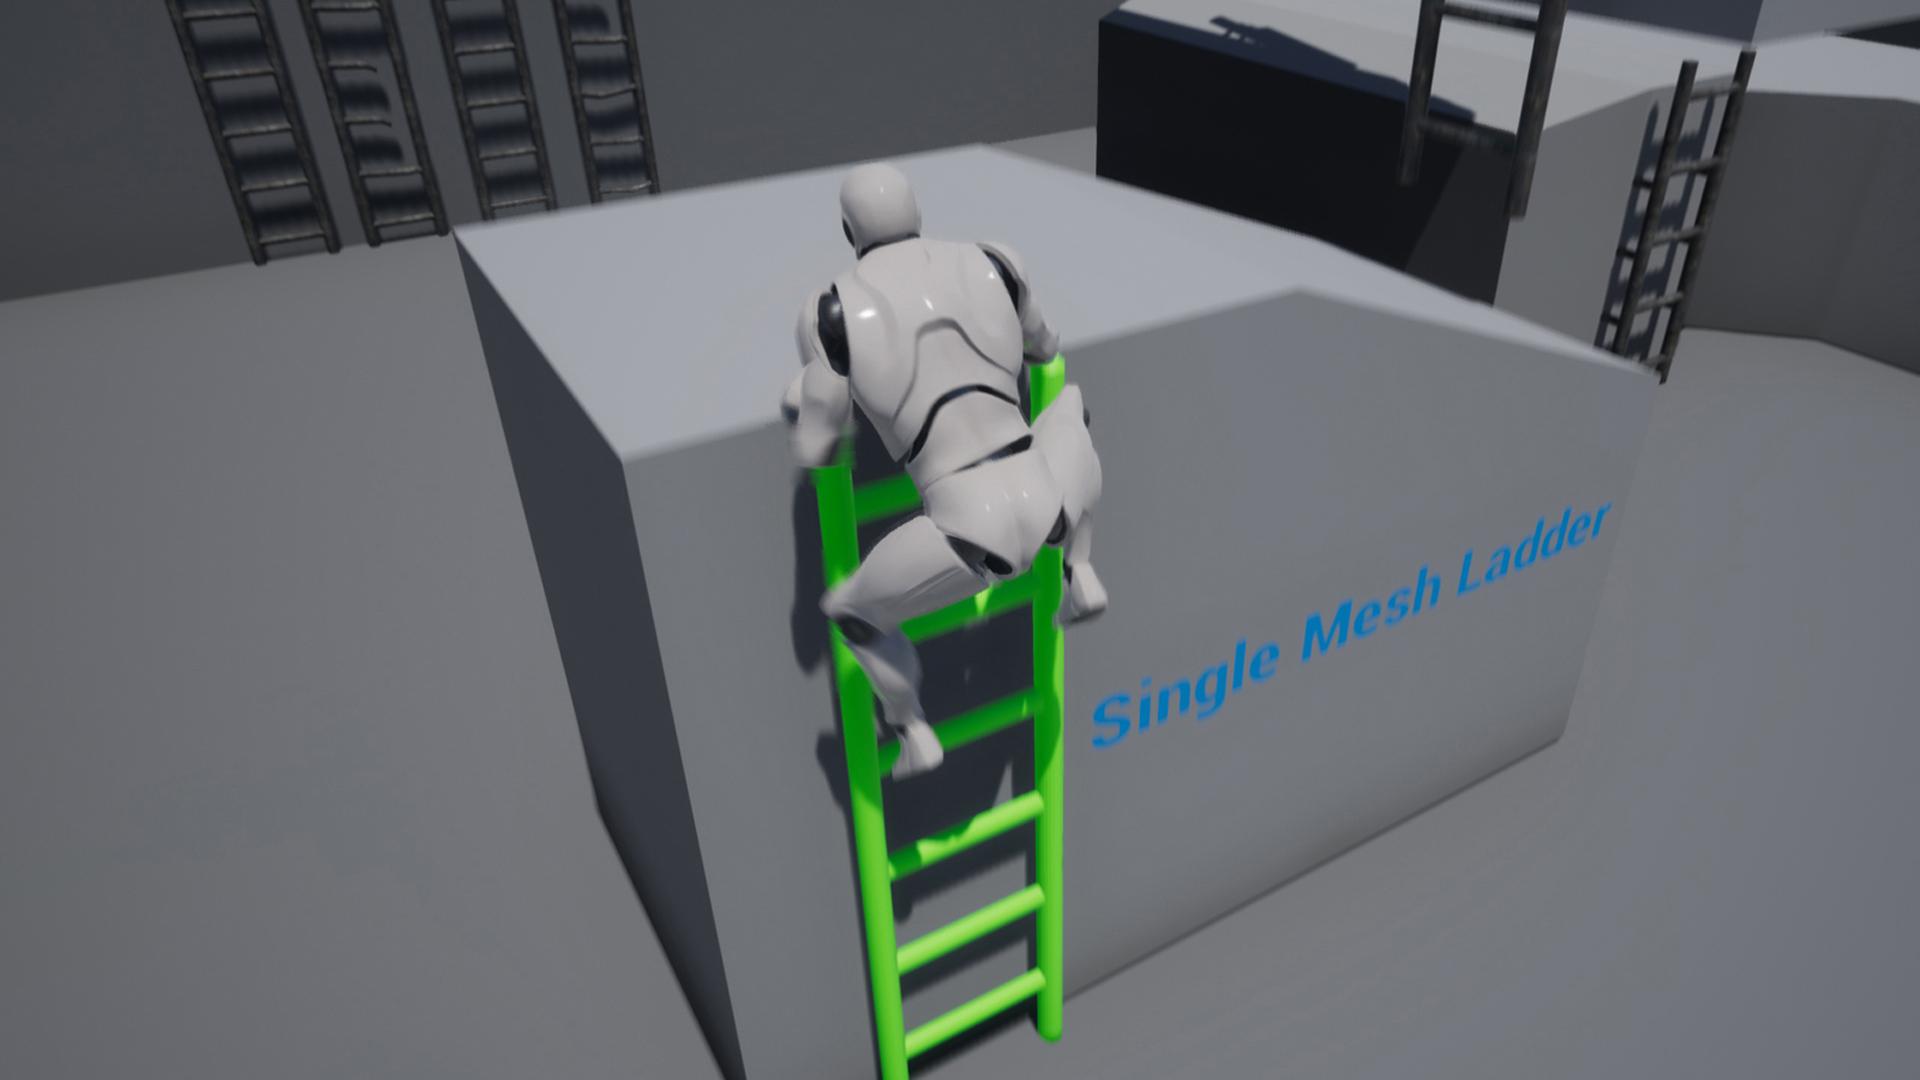 Anther Ladder 在blueprints中由immortal hand studios创建的ladder system